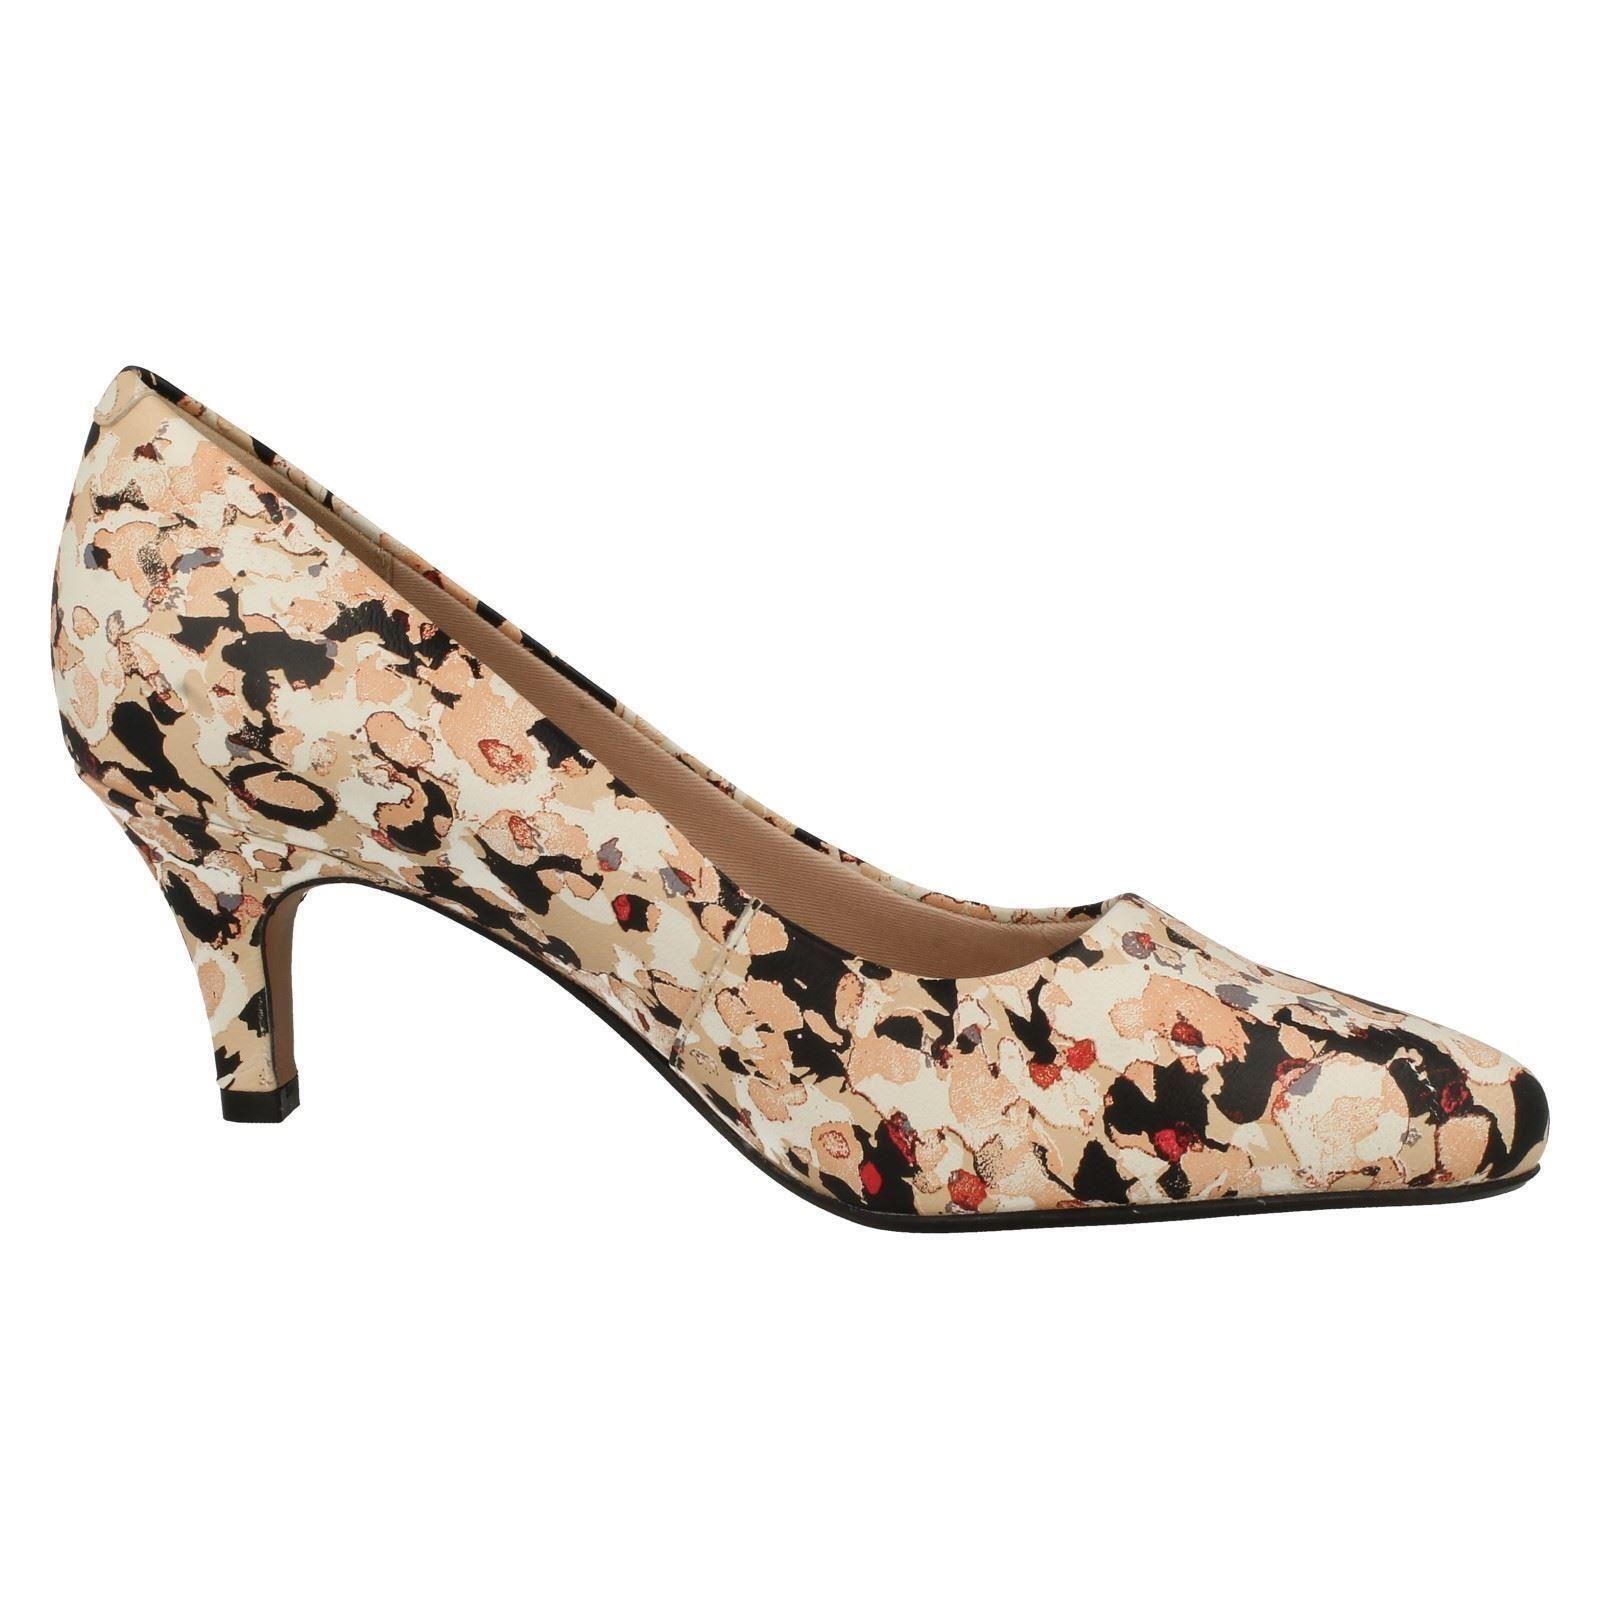 Femmes Formal/Court Clarks Formal/Court Femmes Slip on Chaussures Style-Isidora Faye-W 42b266